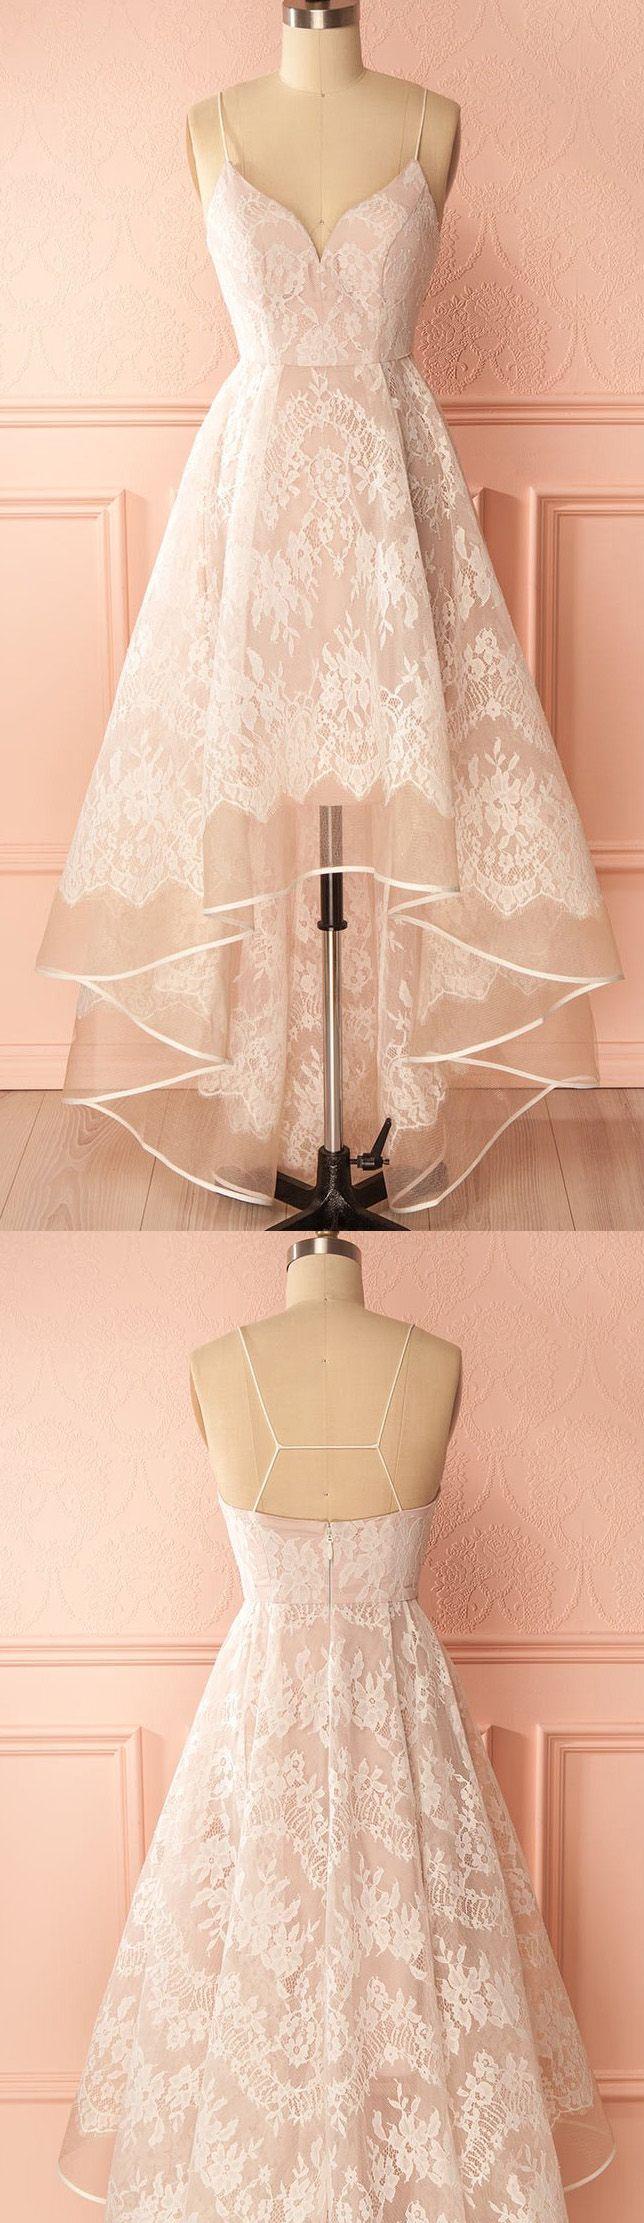 best prom dresses backless images on pinterest backless prom